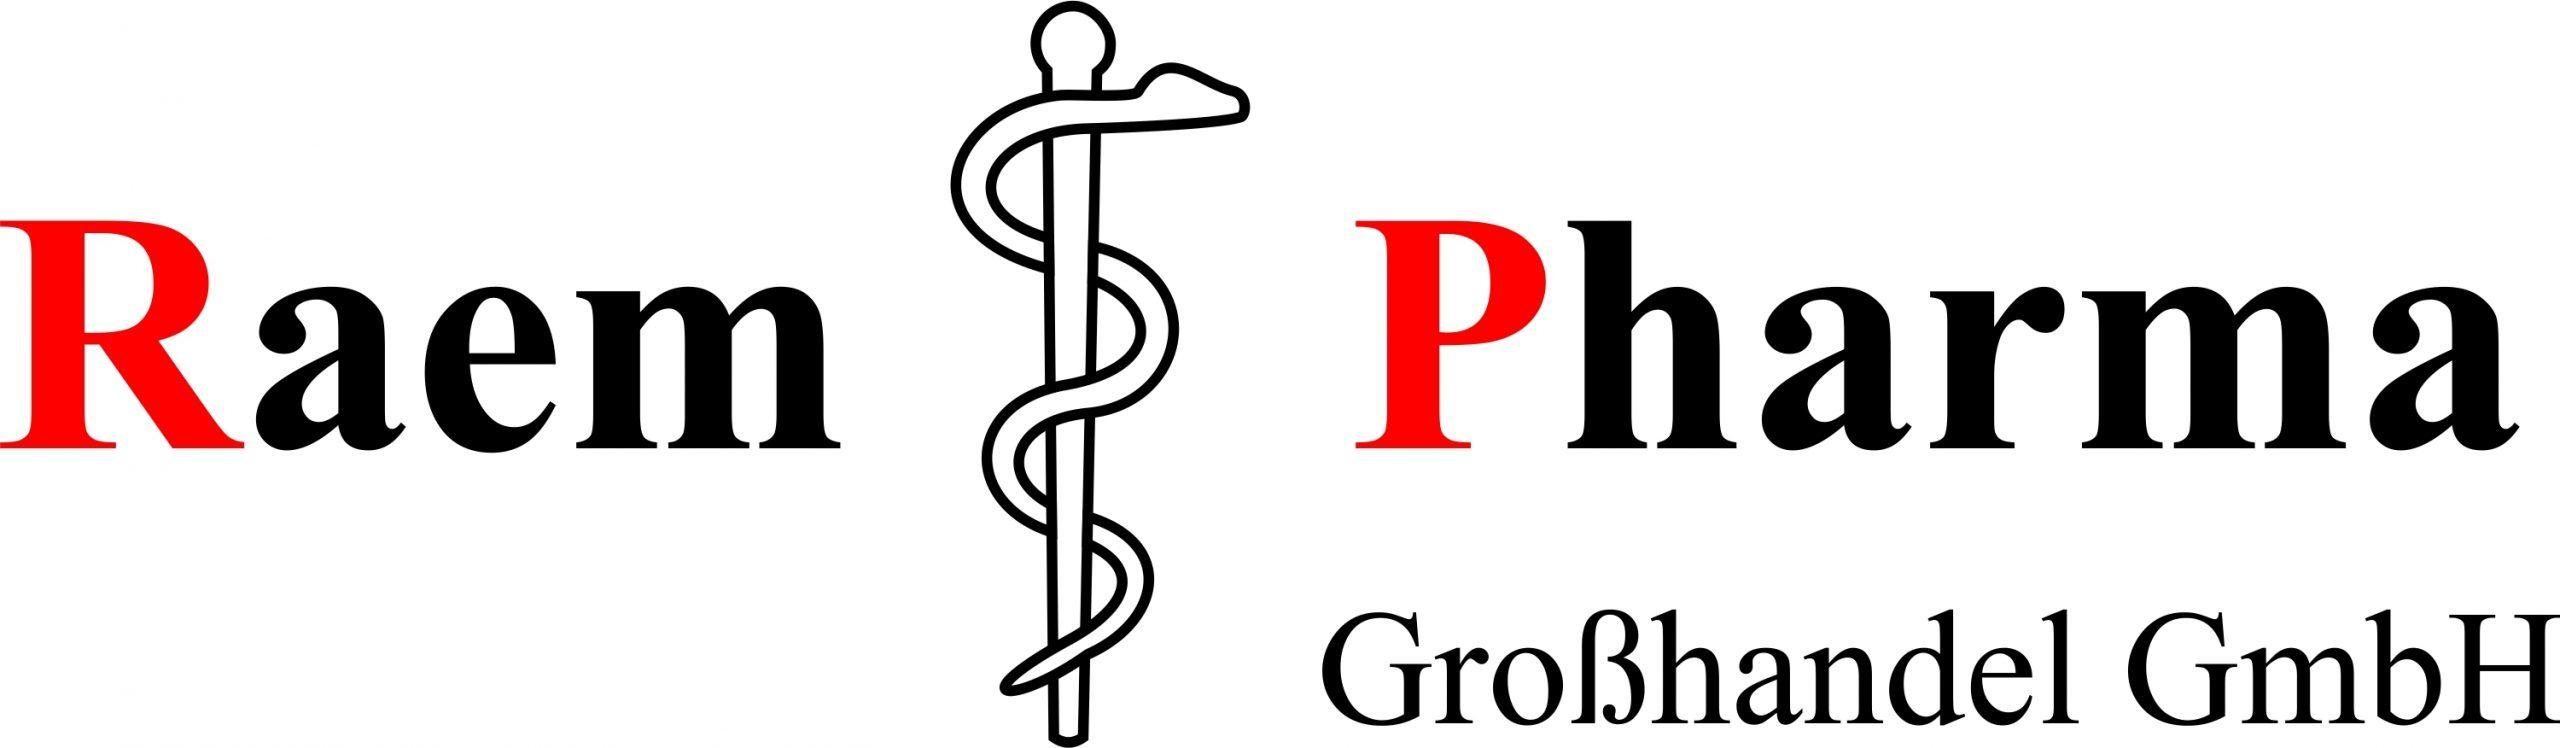 Raem Pharma Großhandel GmbH